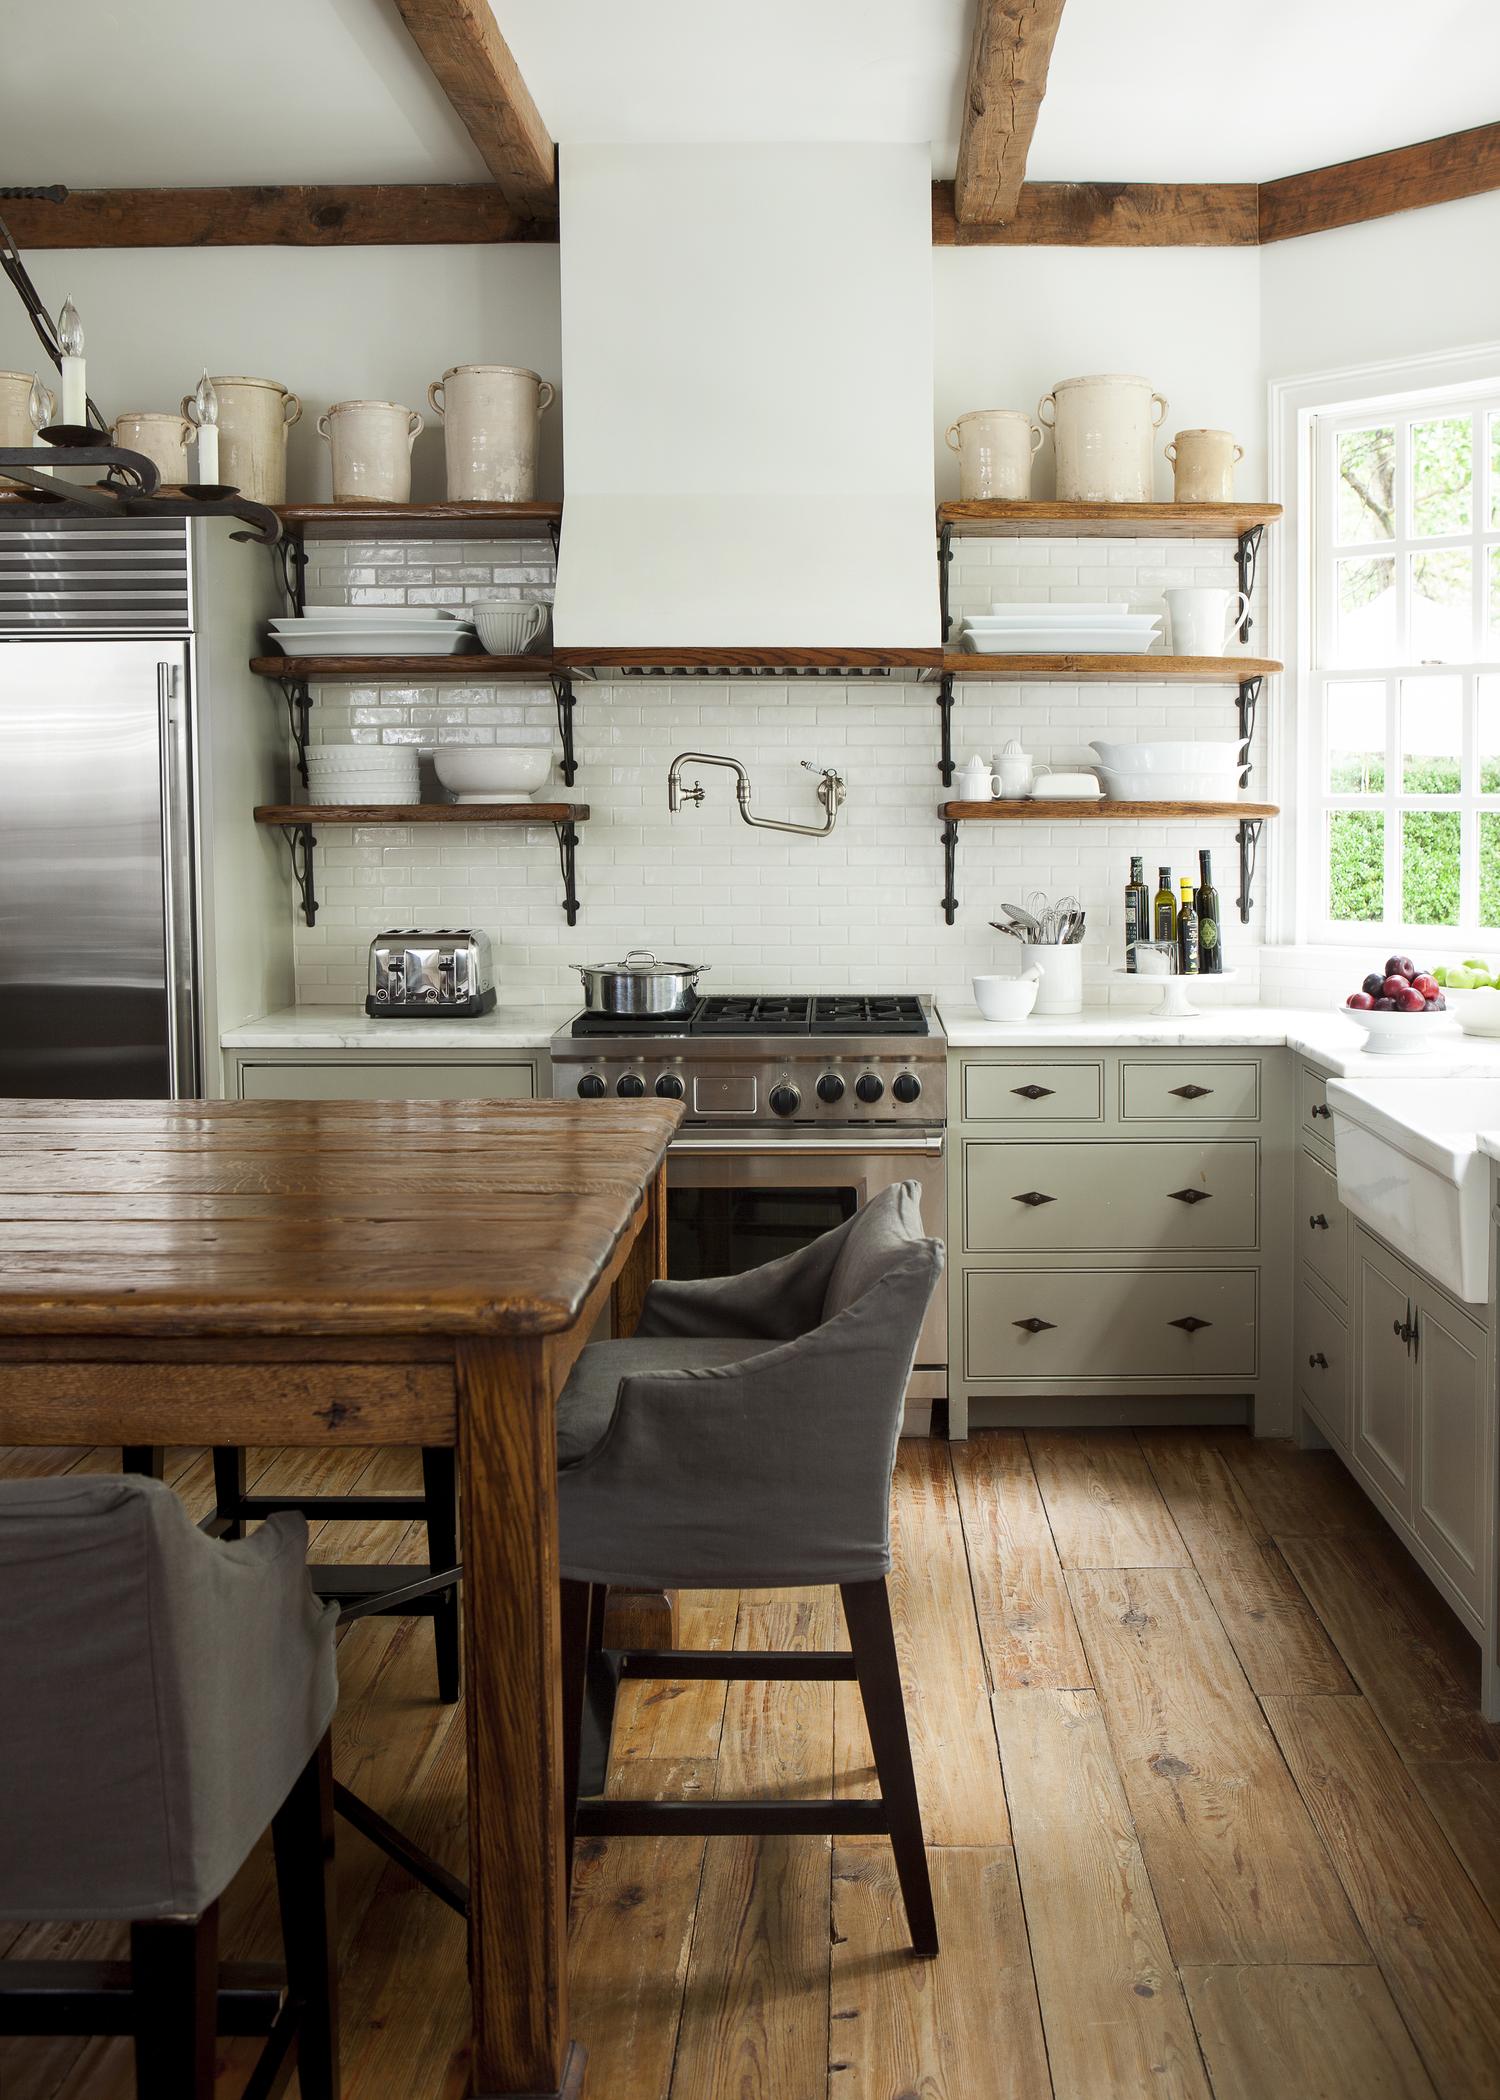 Kitchens Workbook Feature 1500 2100 Farmhouse Kitchen Inspiration Kitchen Inspirations Kitchen Remodel